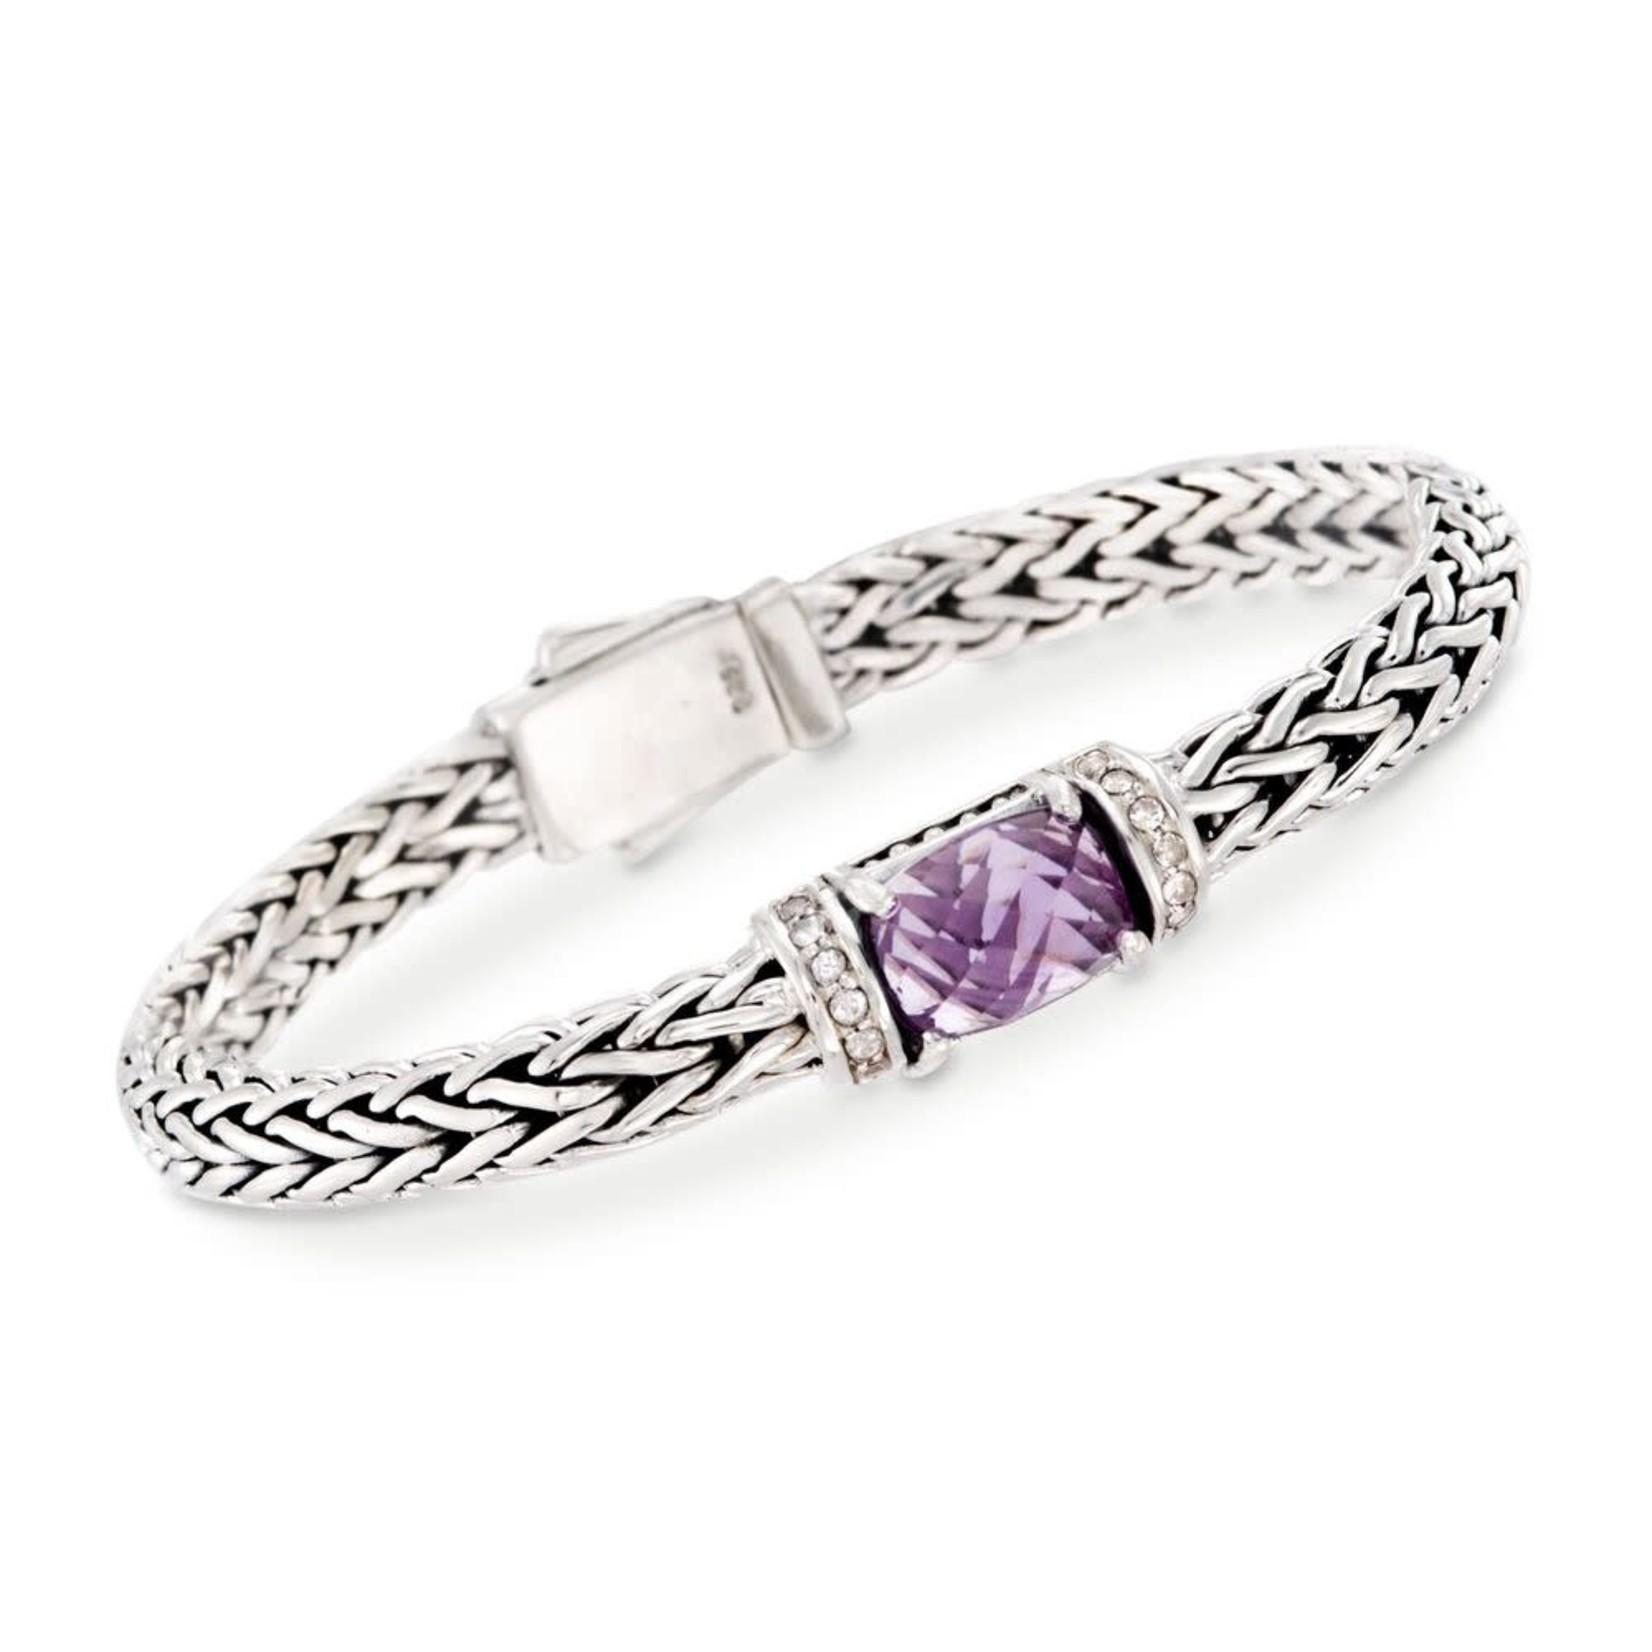 Sterling Silver Amethyst & White Topaz Weave Bracelet